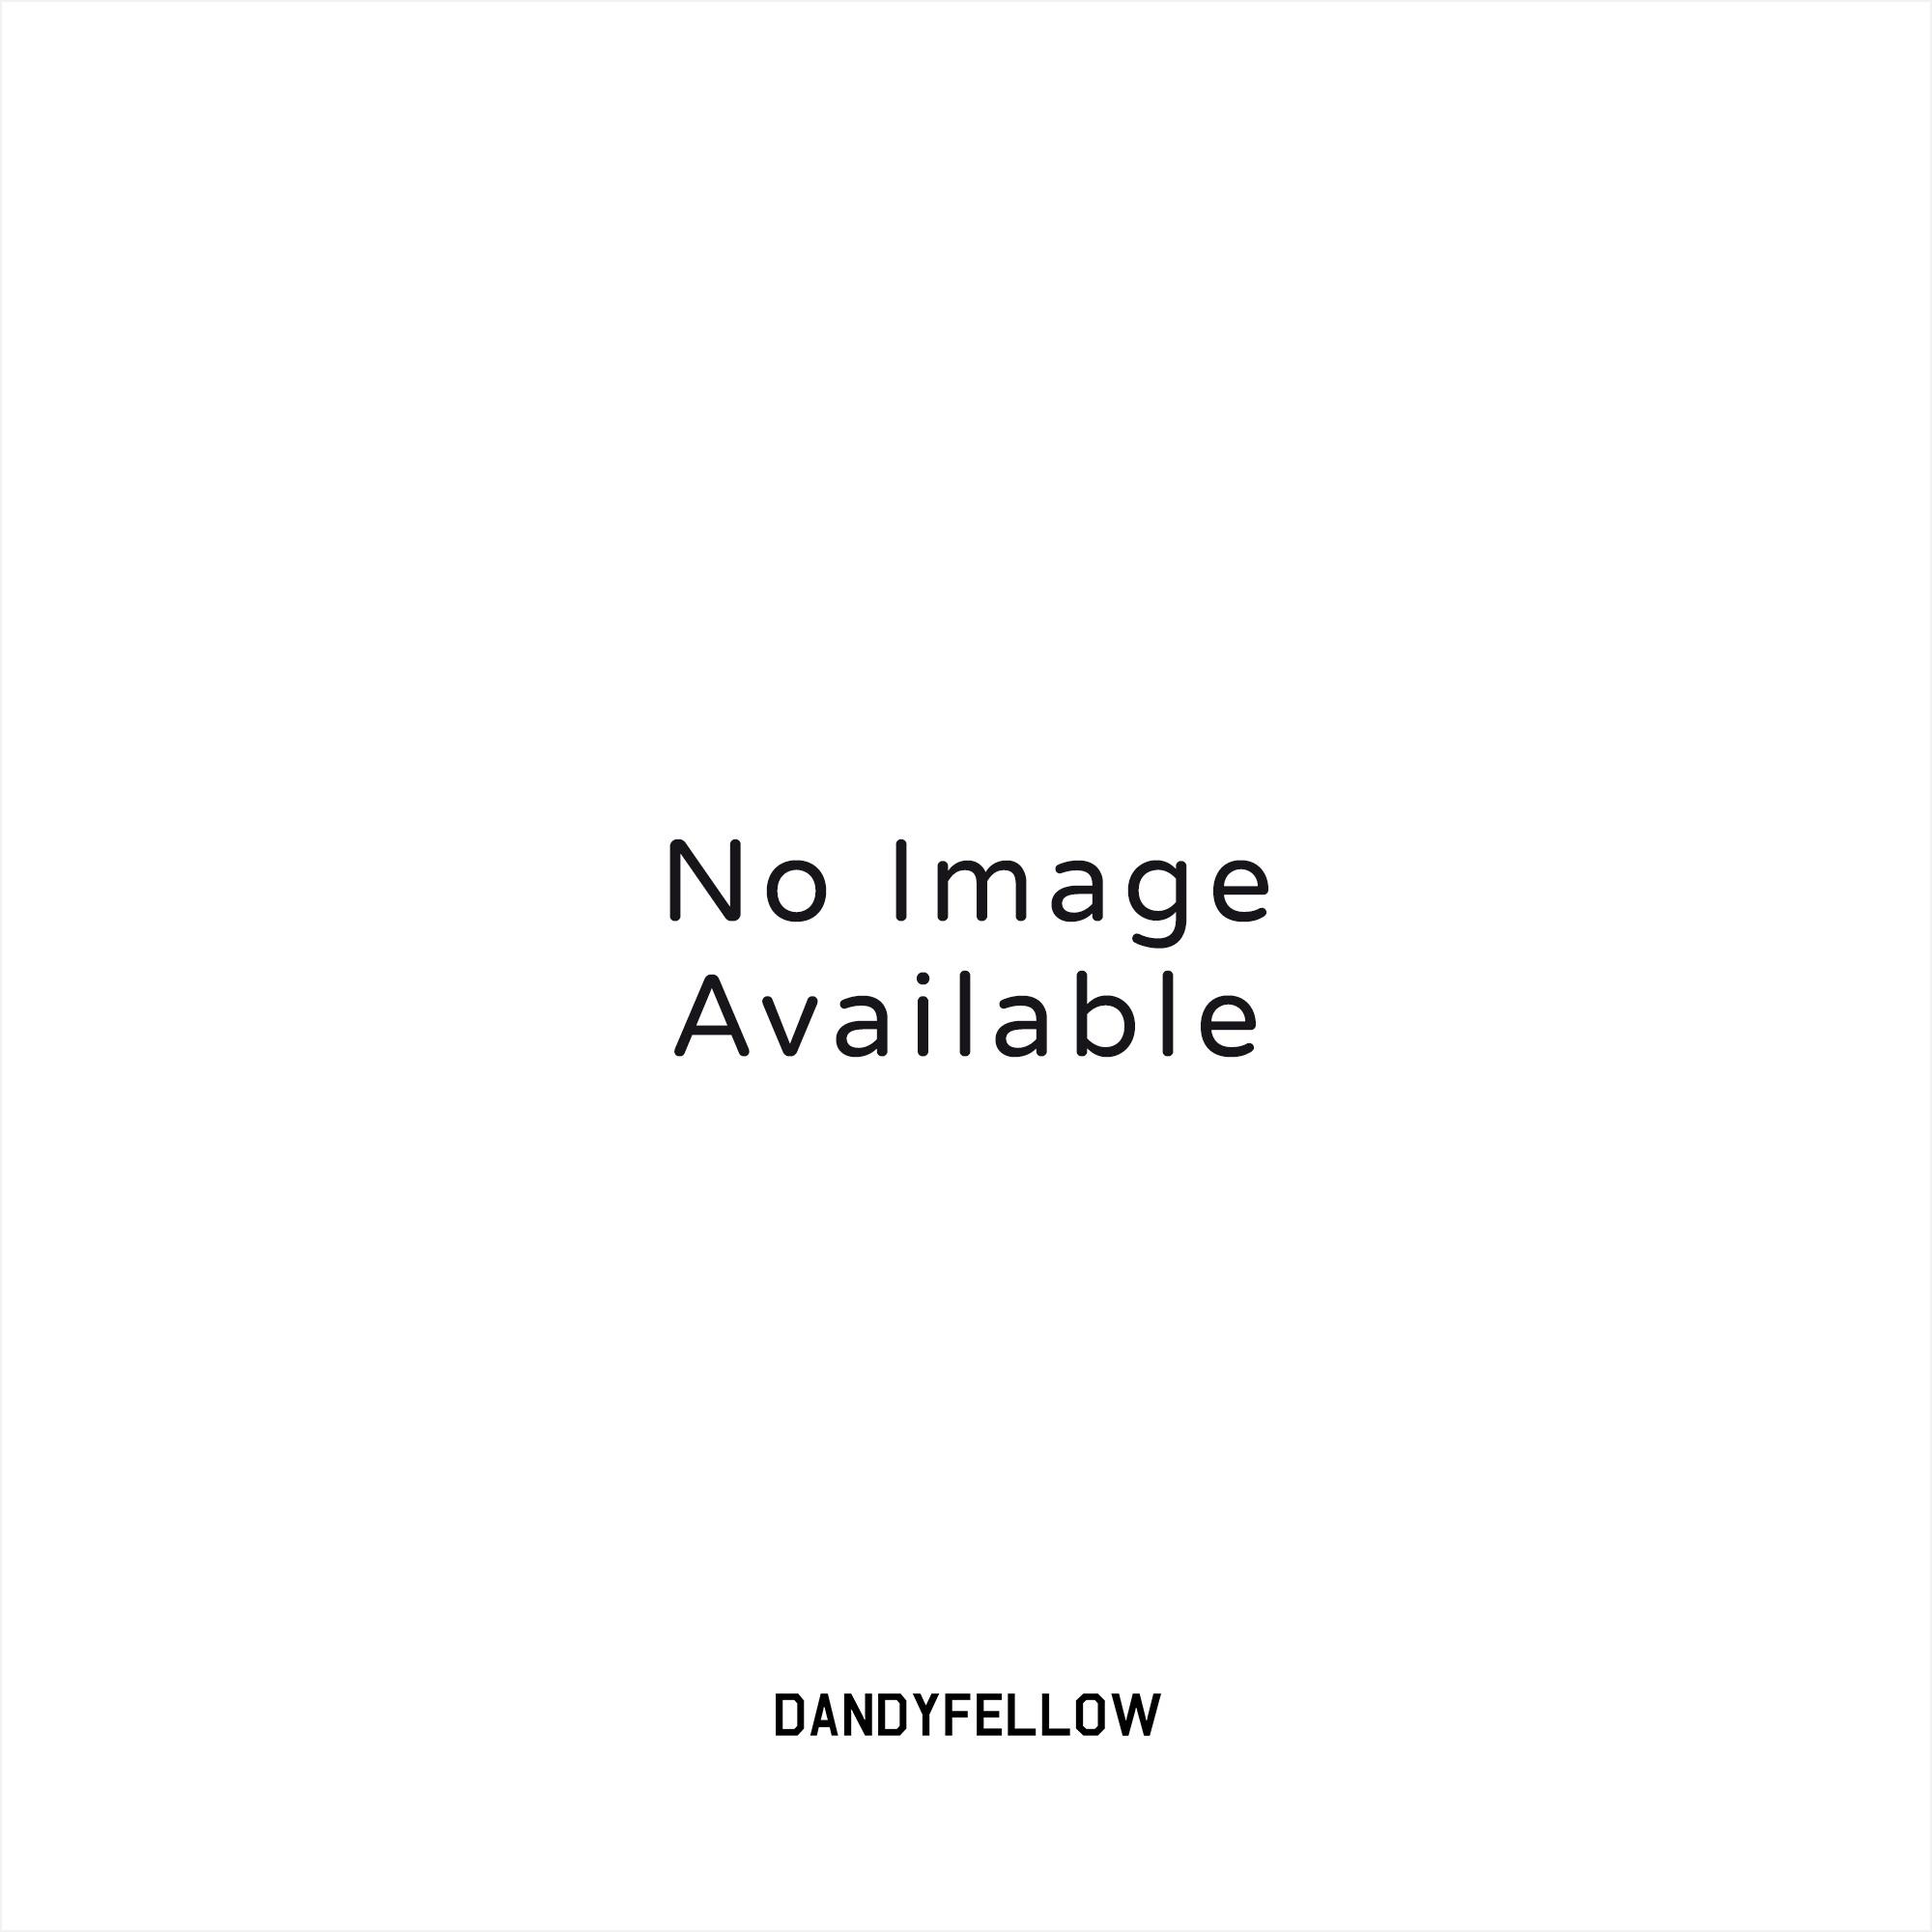 e6a48dc2b40 Etsi Barbour tuotteet ja tarjoukset - Enligo